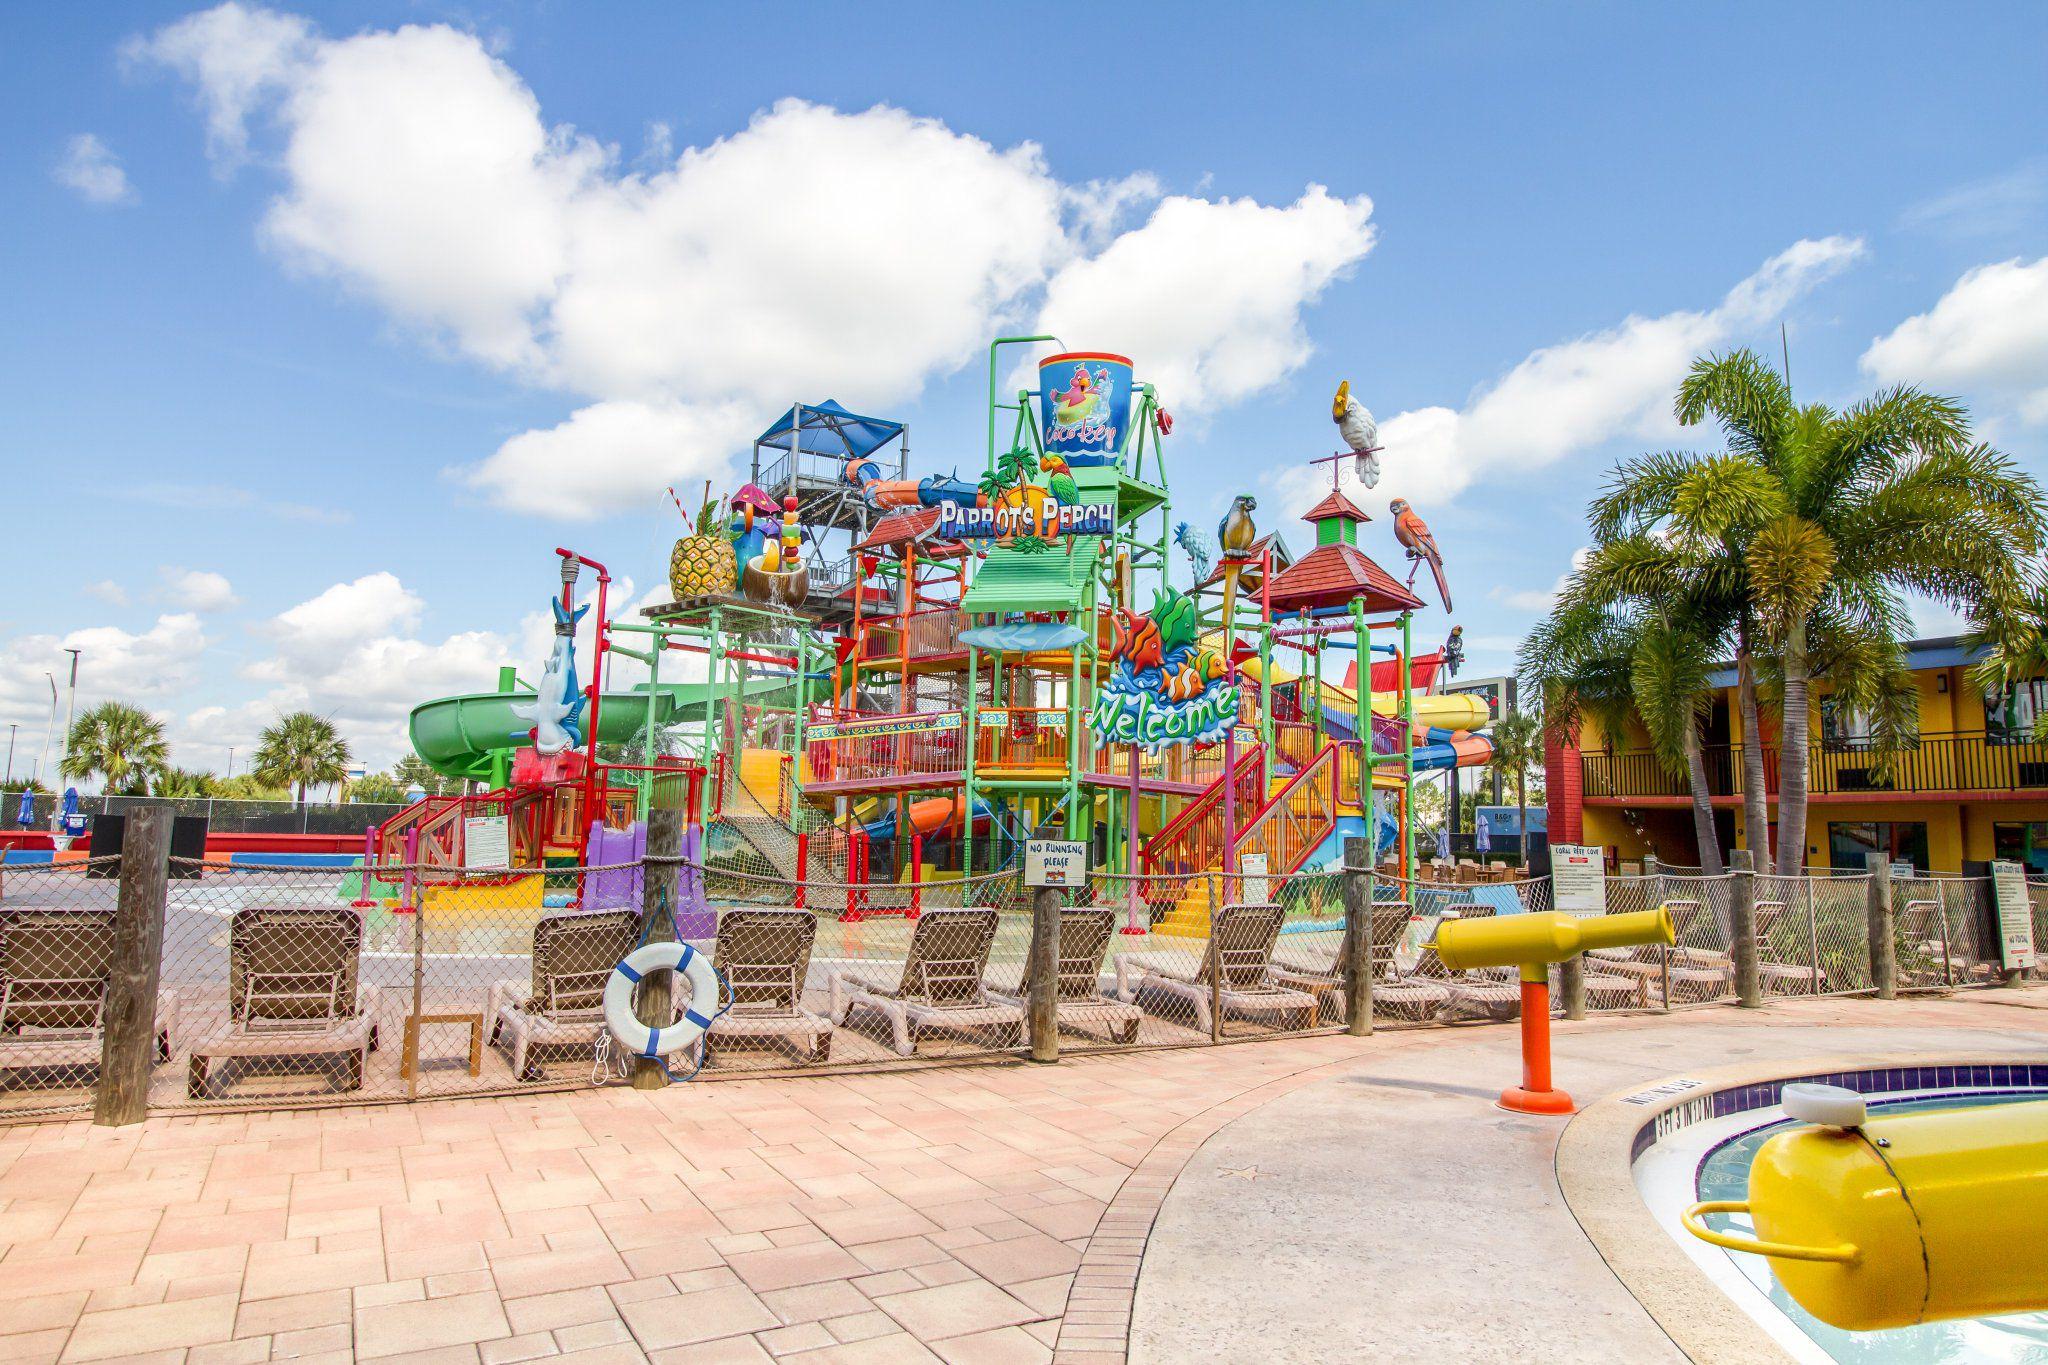 Water Park Fun at CoCo Key Resort in Orlando